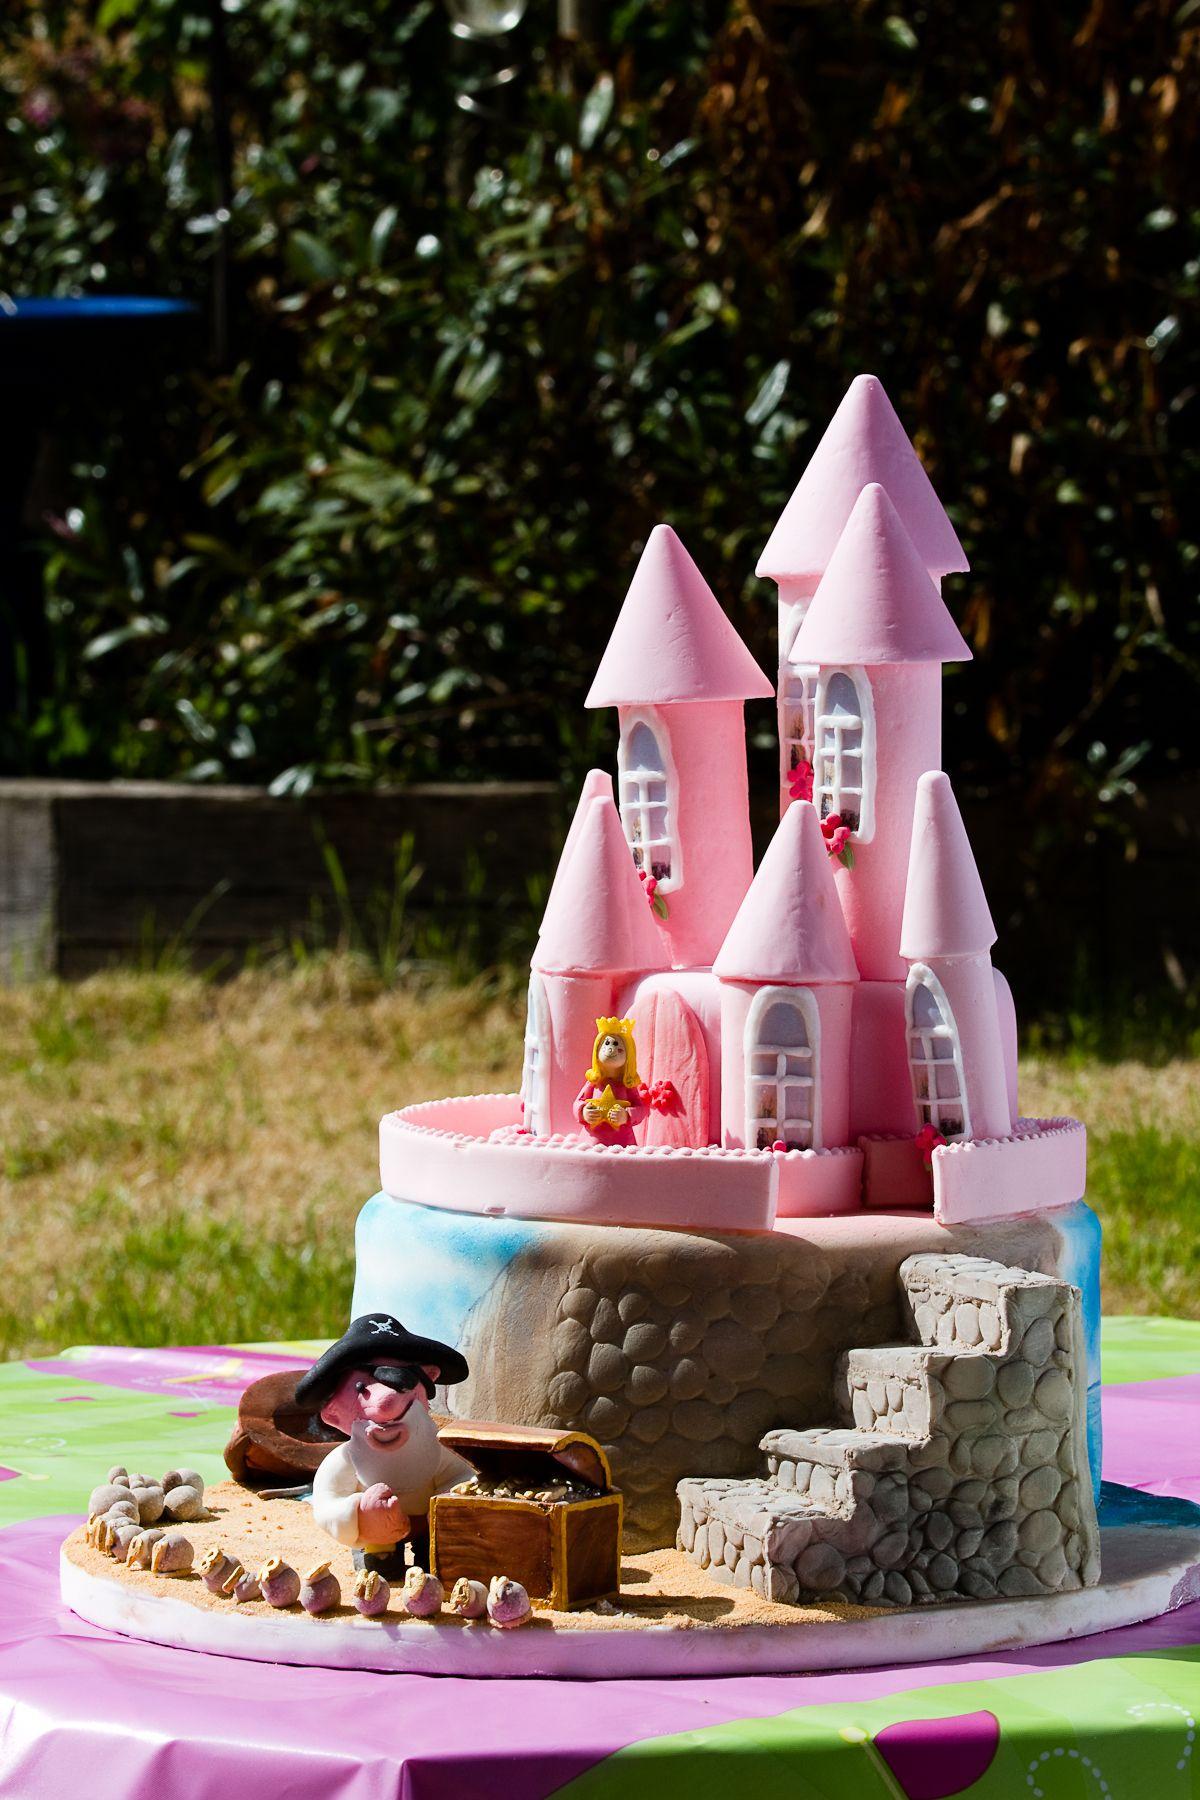 Cake ideas on pinterest pirate cakes marshmallow fondant and - Pirate Princess Cake Chocodebs Cakes Blog Archive Pink Pirate And Princess Cake